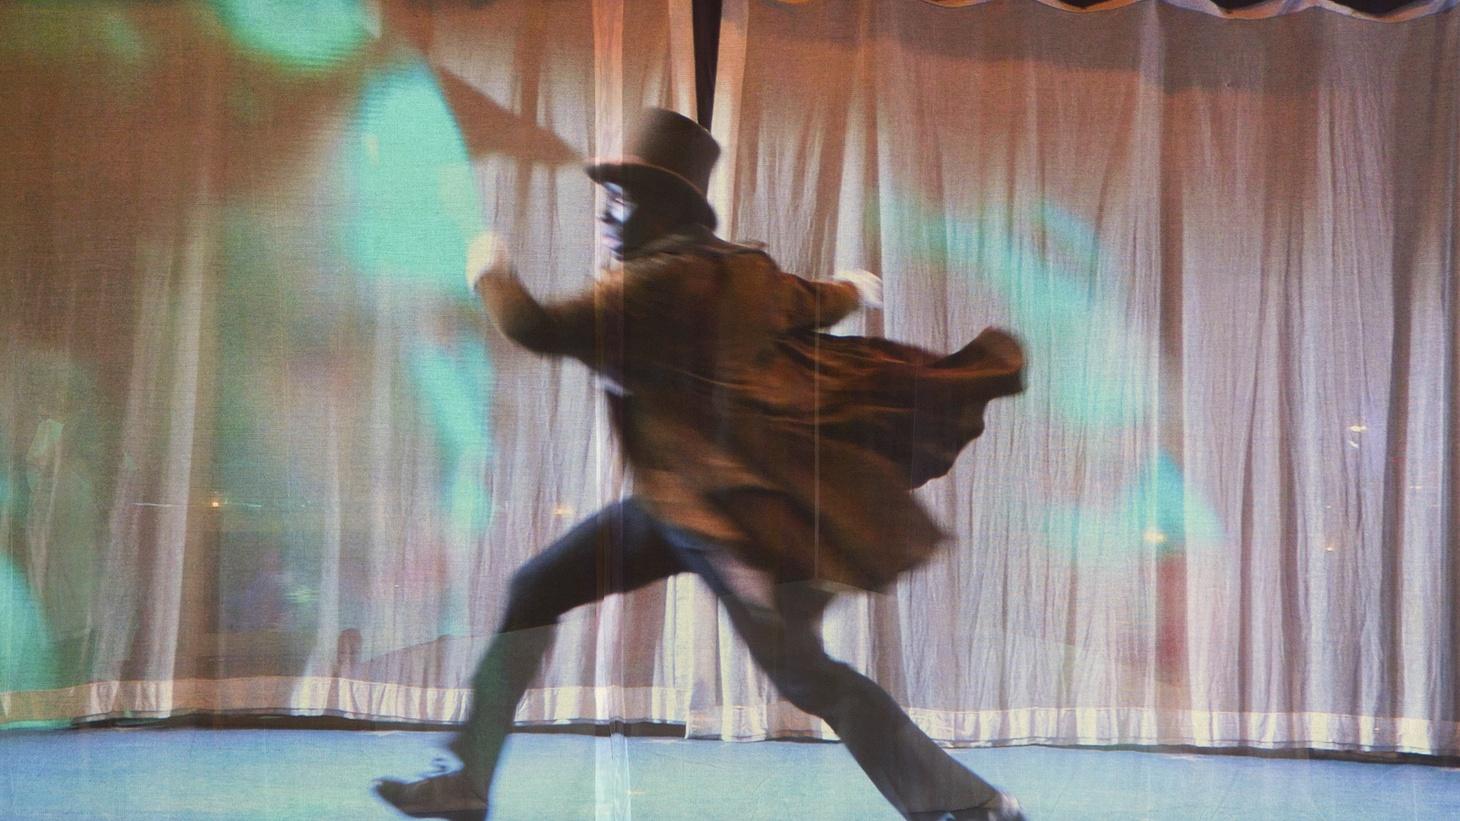 Hunter Drohojowska-Philp suggests the artist's award-winning play Until, Until, Until…along with the art of Samuel Levi Jones.